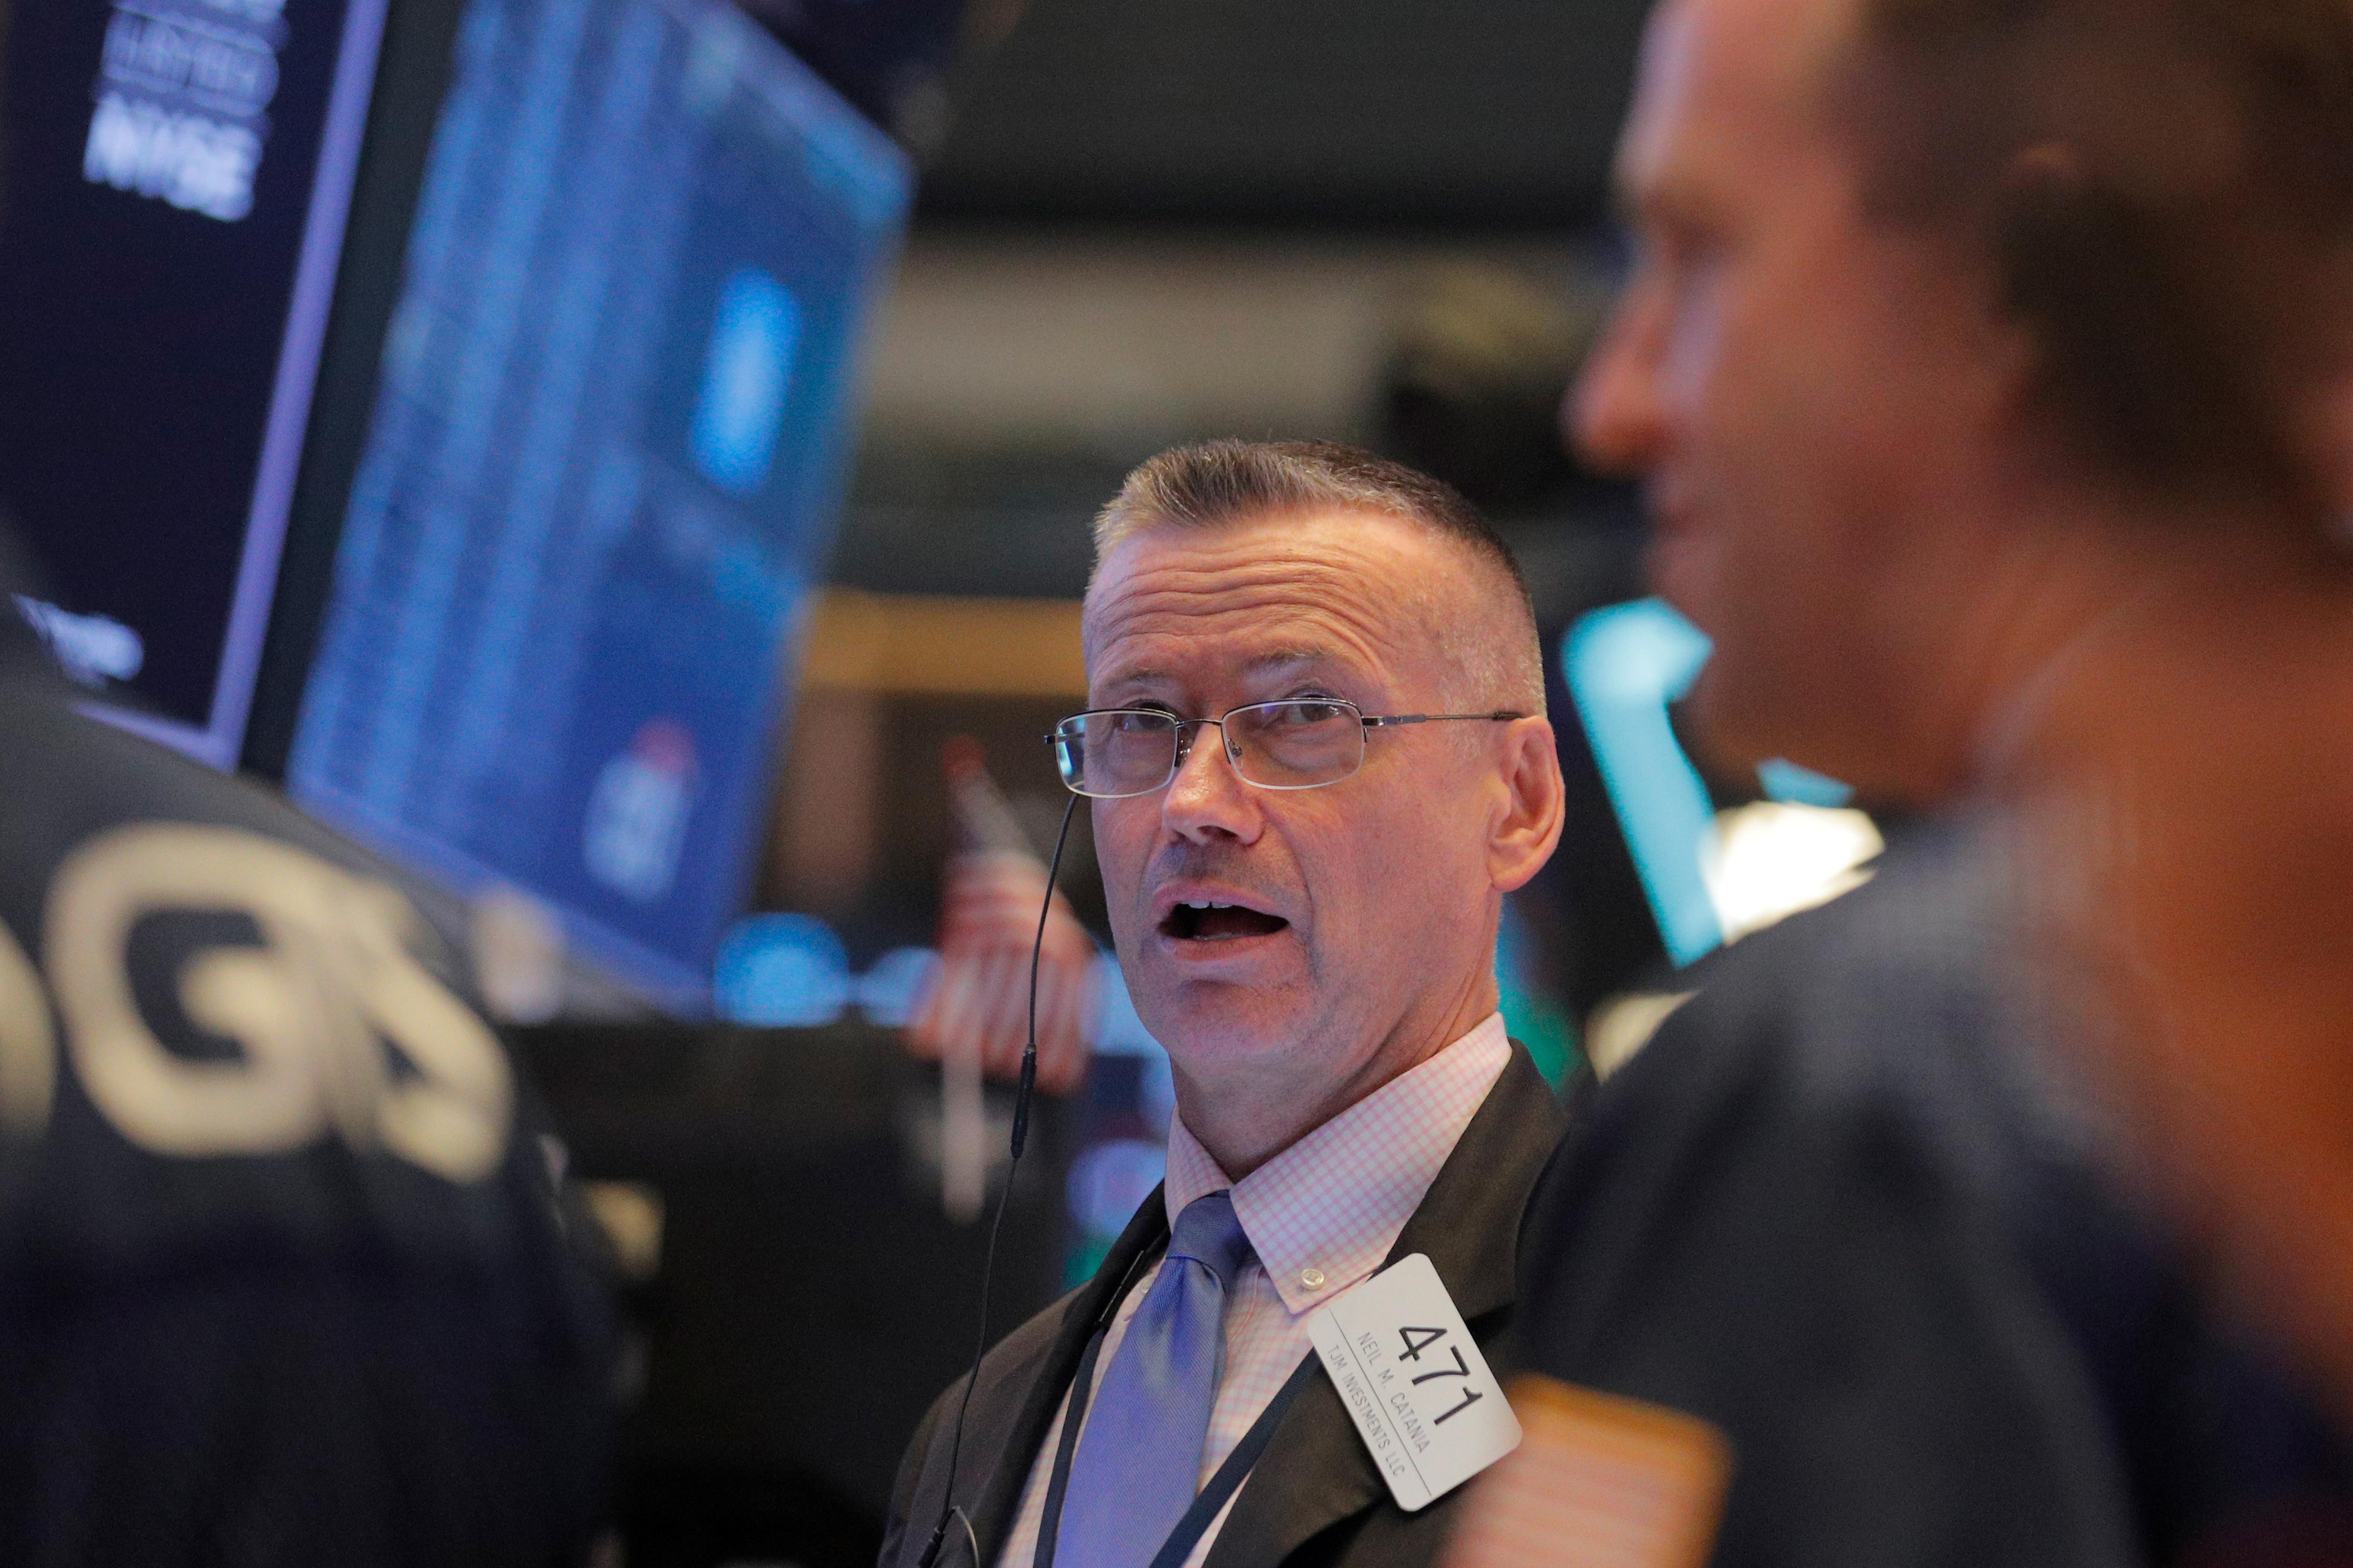 Stocks flat on data, earnings; pound volatile